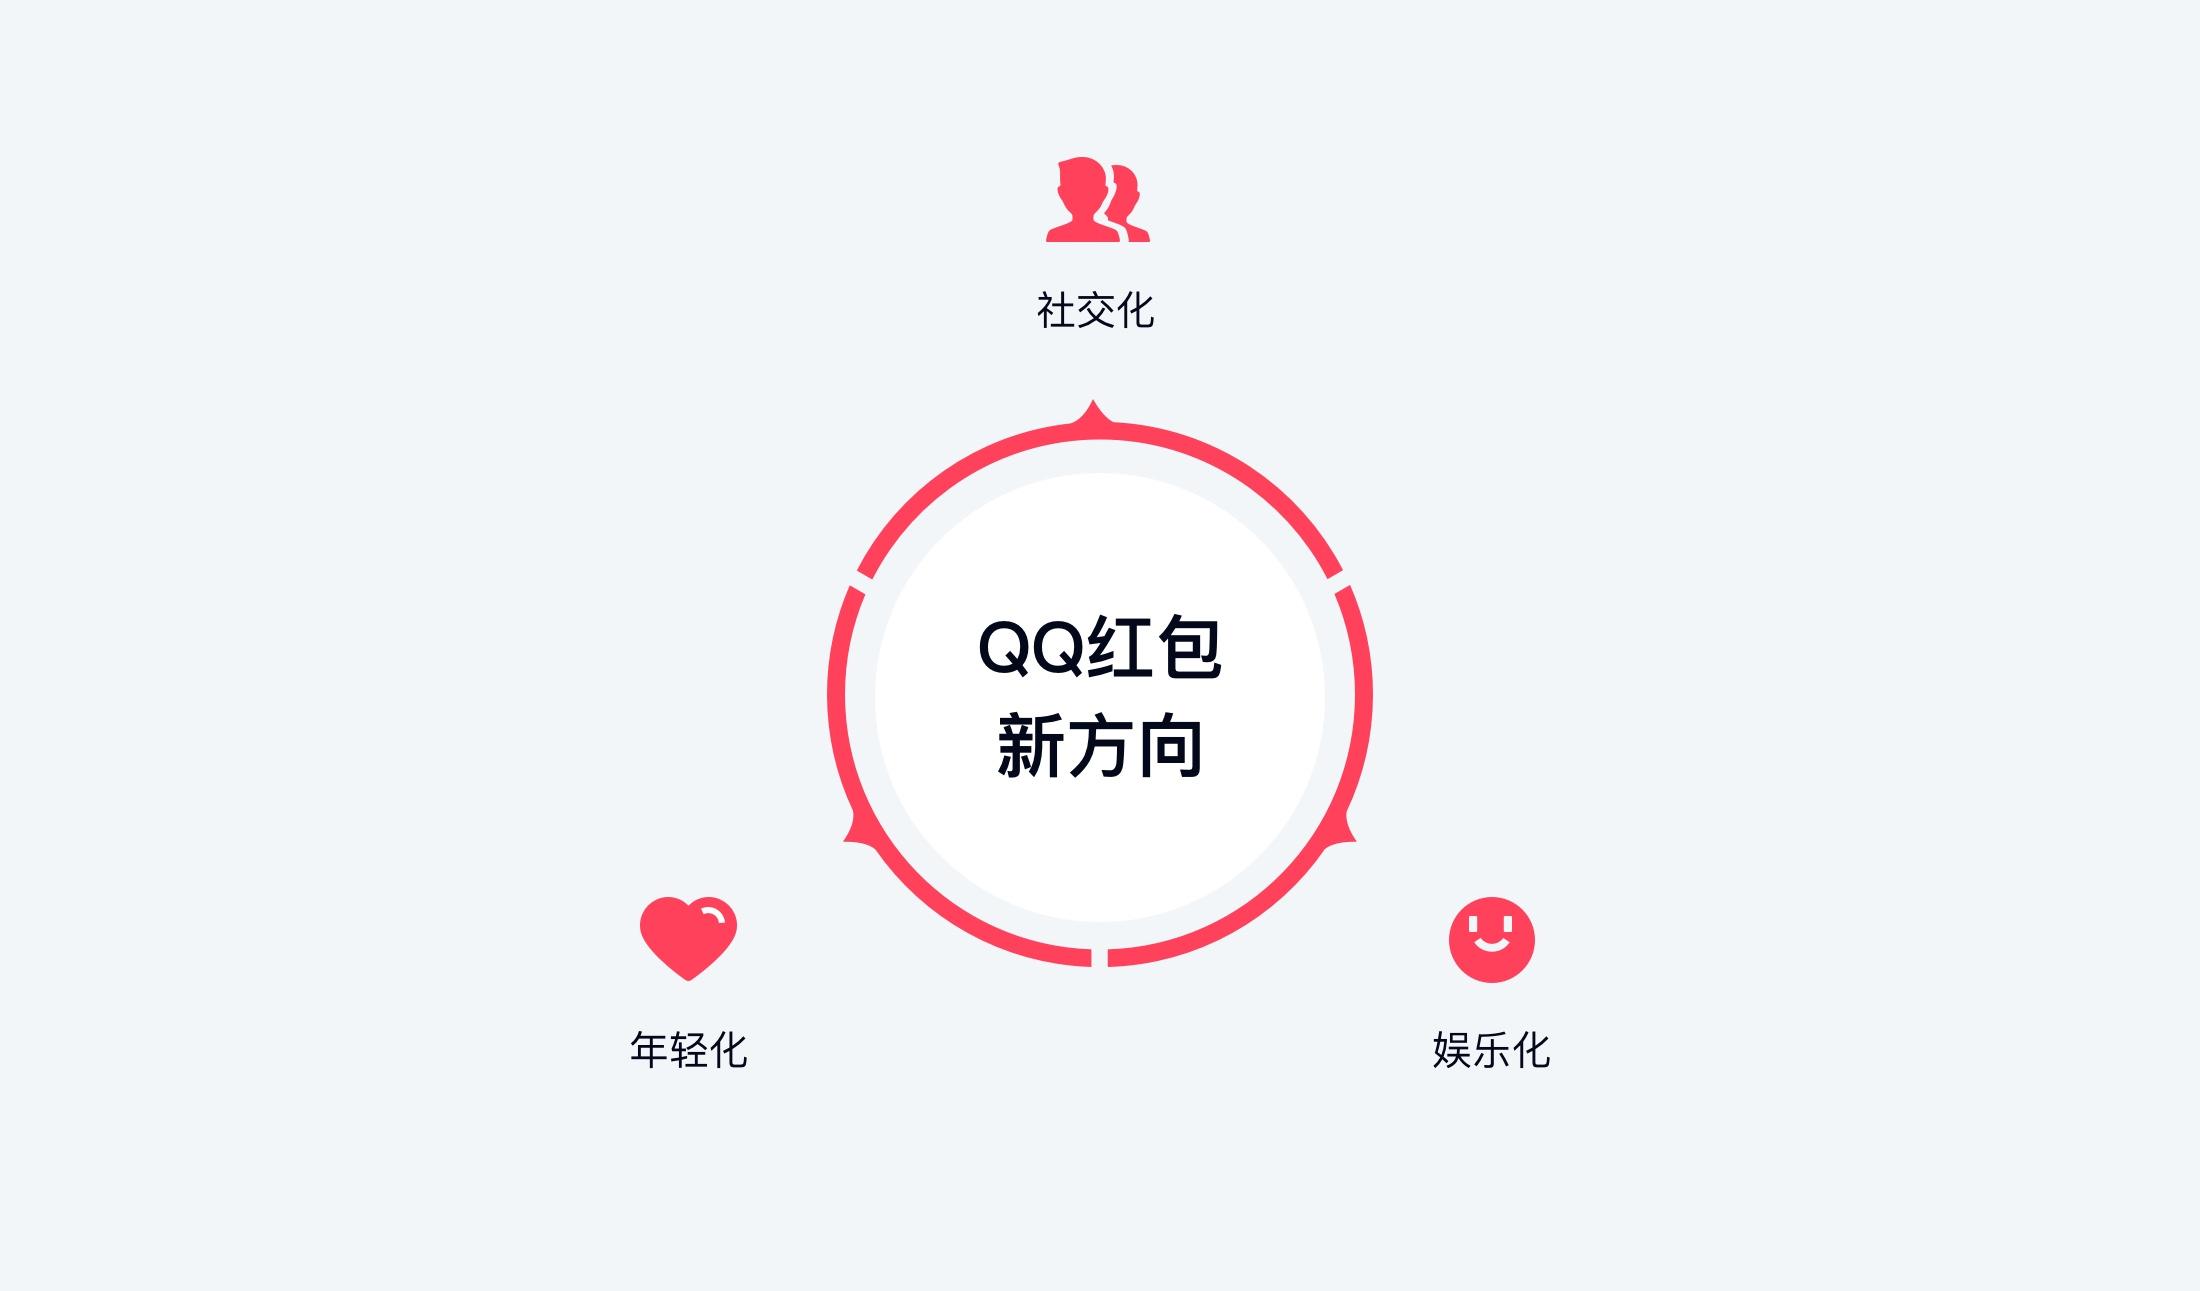 QQ红包 | 趣味新玩法是怎么设计的?--运营喵的世界